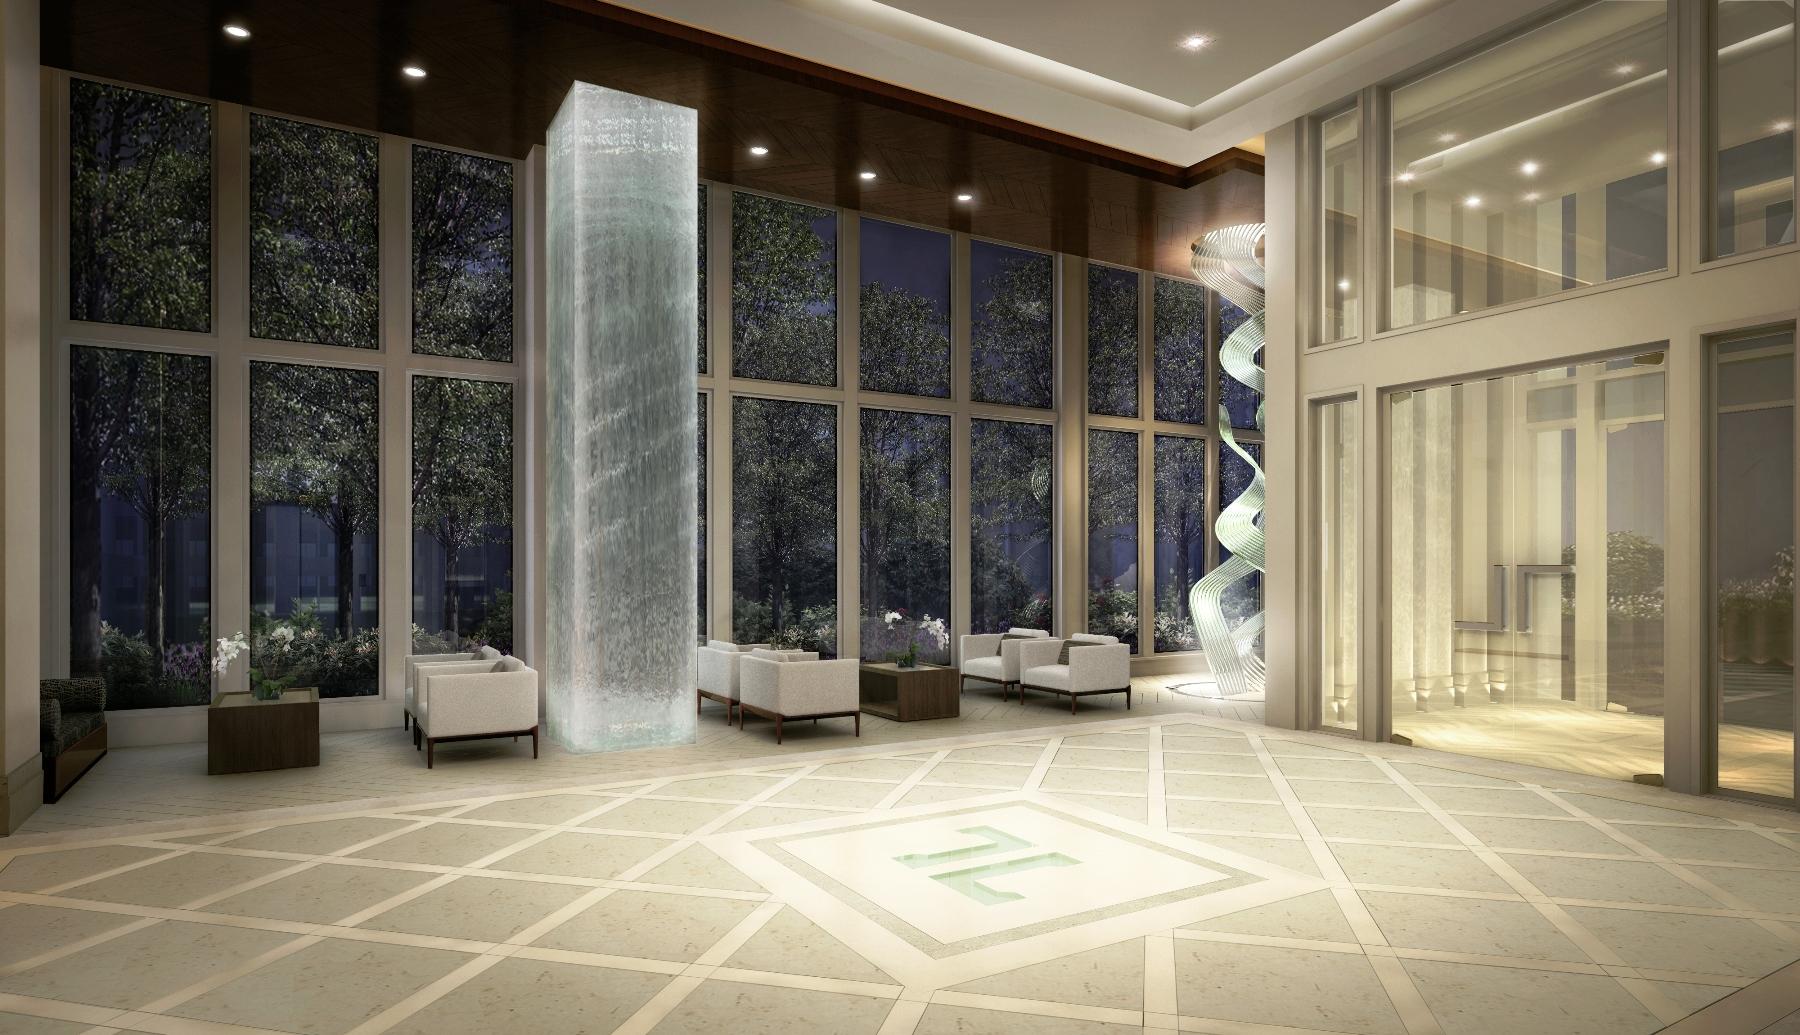 Condominium for Sale at The Lauren 4802 Montgomery Ln 701 Bethesda, Maryland 20814 United States